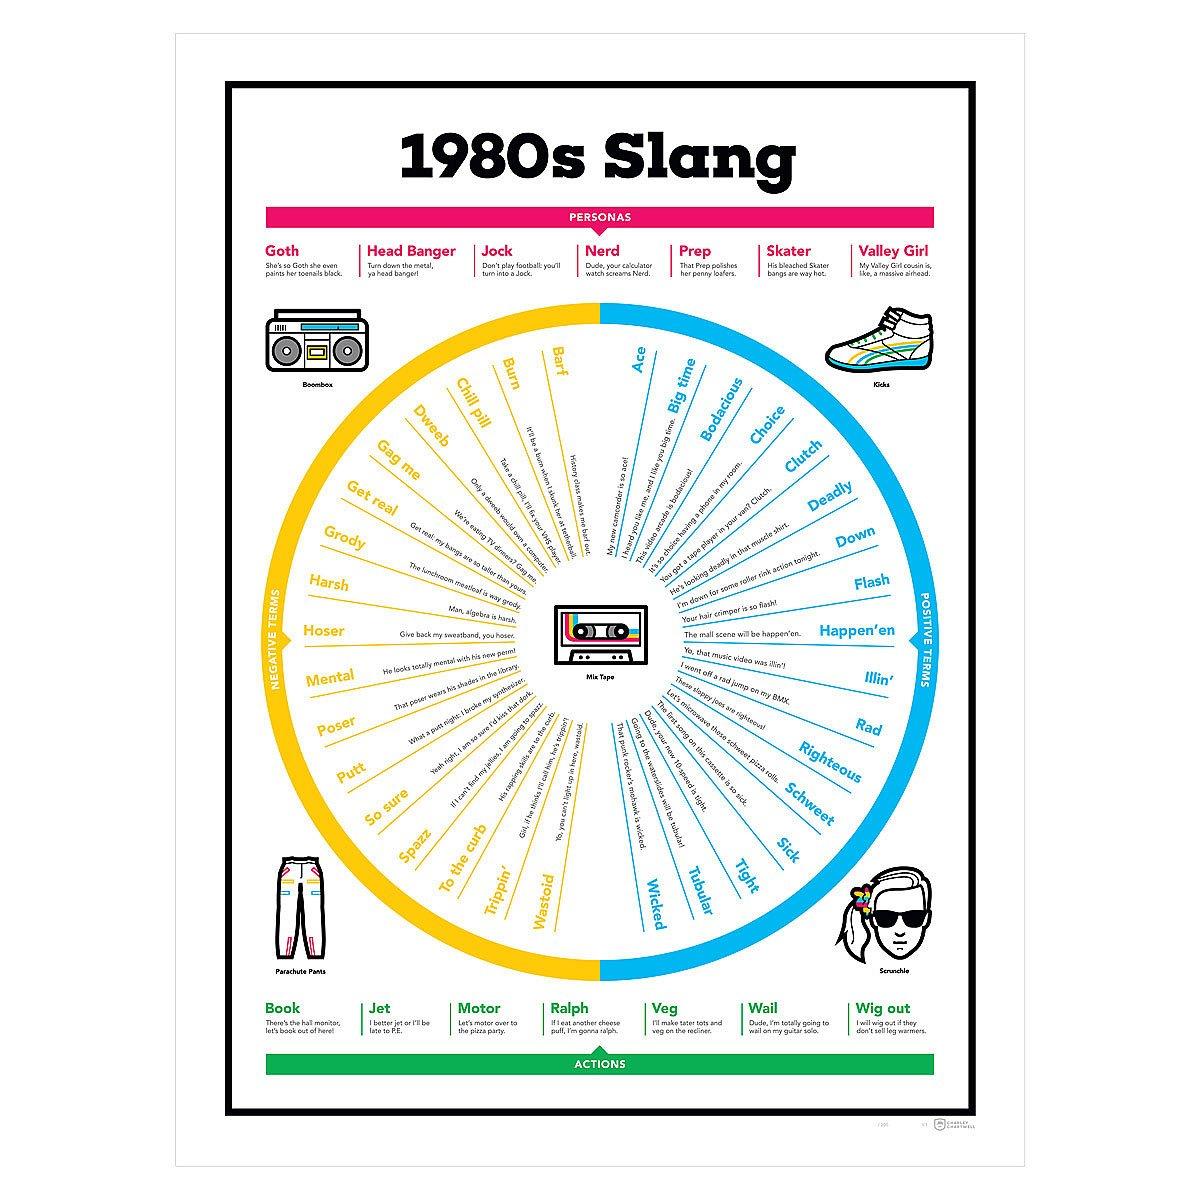 1980s Slang Chart